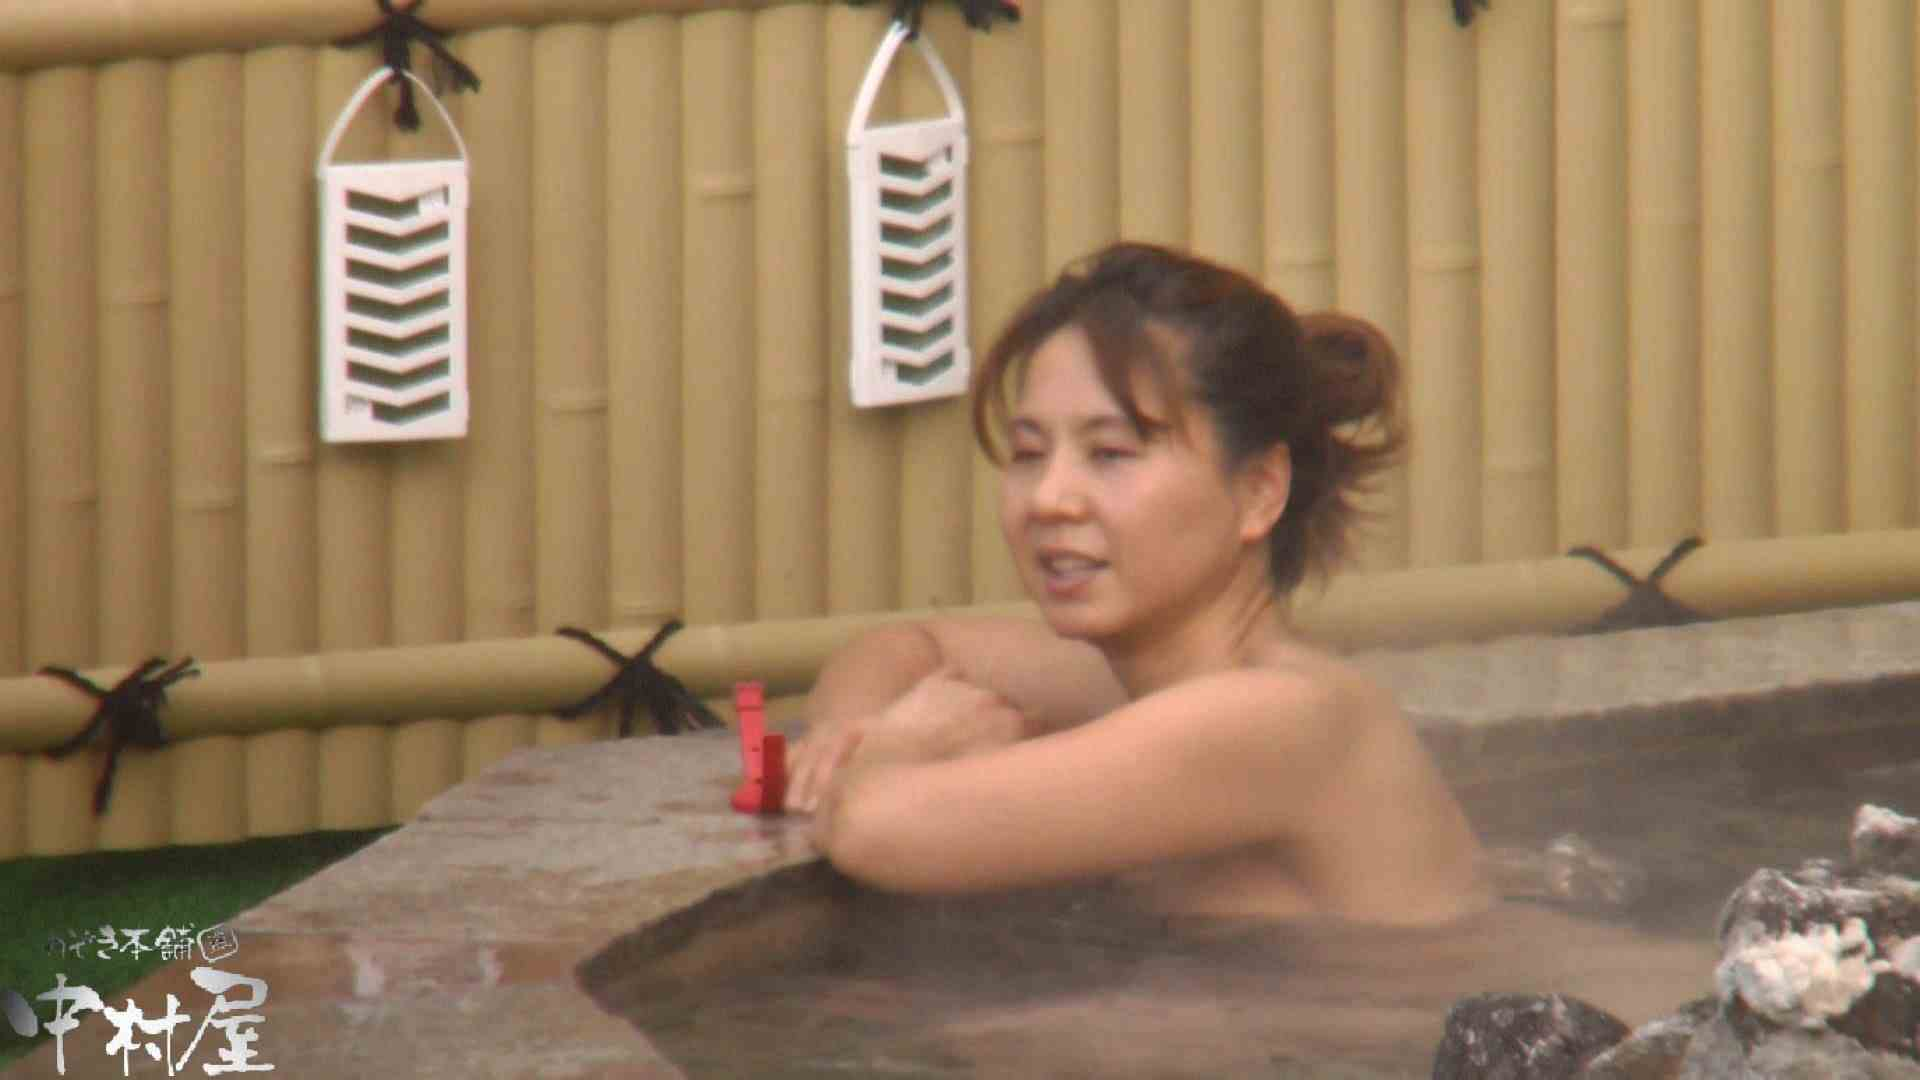 Aquaな露天風呂Vol.915 OLすけべ画像 オマンコ動画キャプチャ 99連発 44